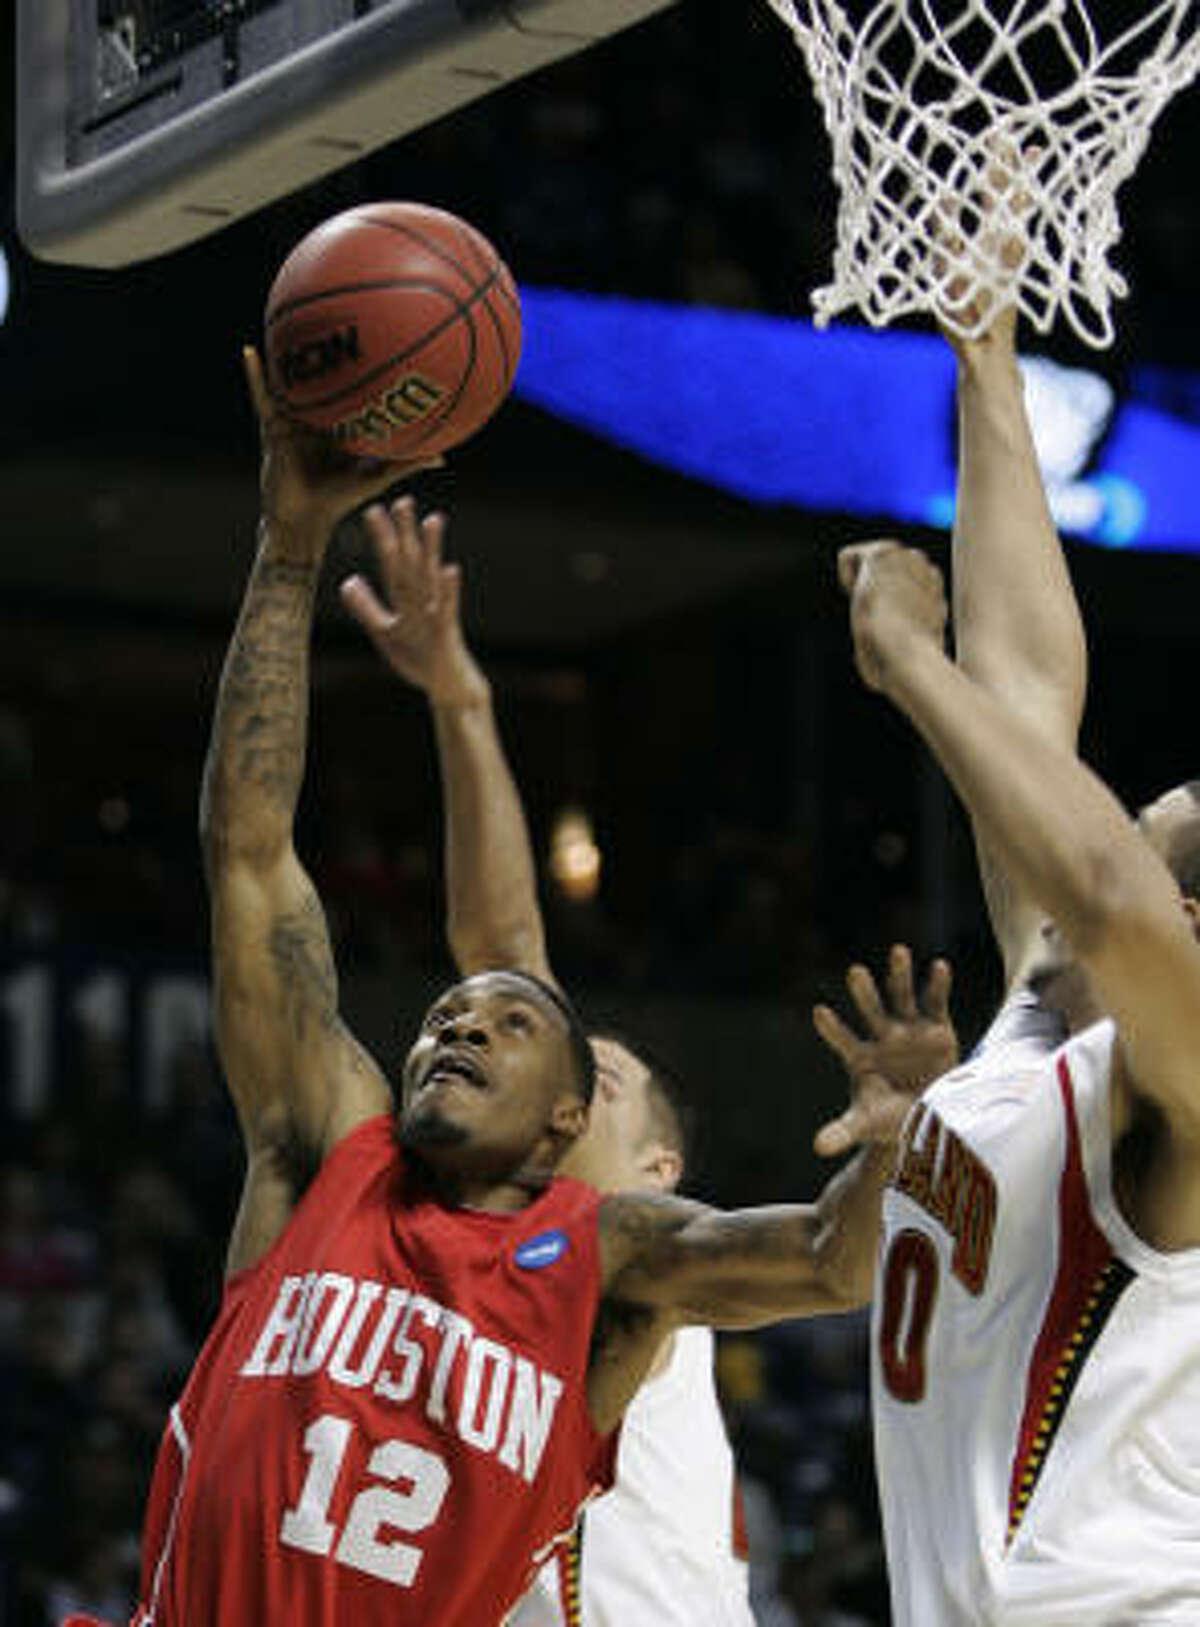 UH guard Aubrey Coleman puts up a shot as Maryland's Jordan Williams, right, tries to block it.